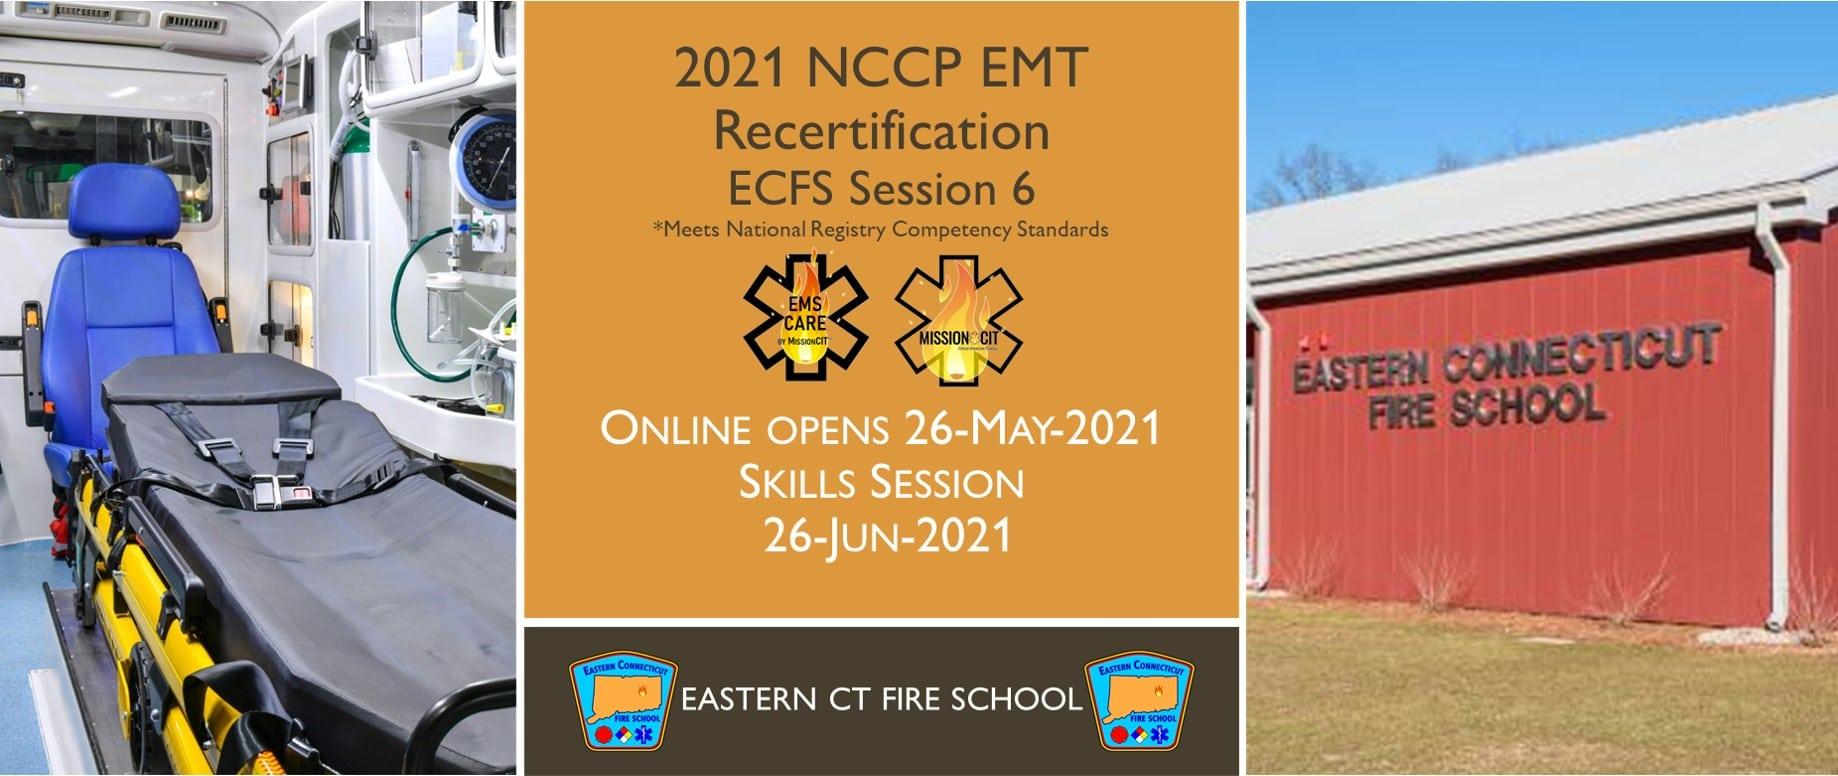 EMT NCCP Recertification Hybrid Course | ECFS | 2021 Session 6